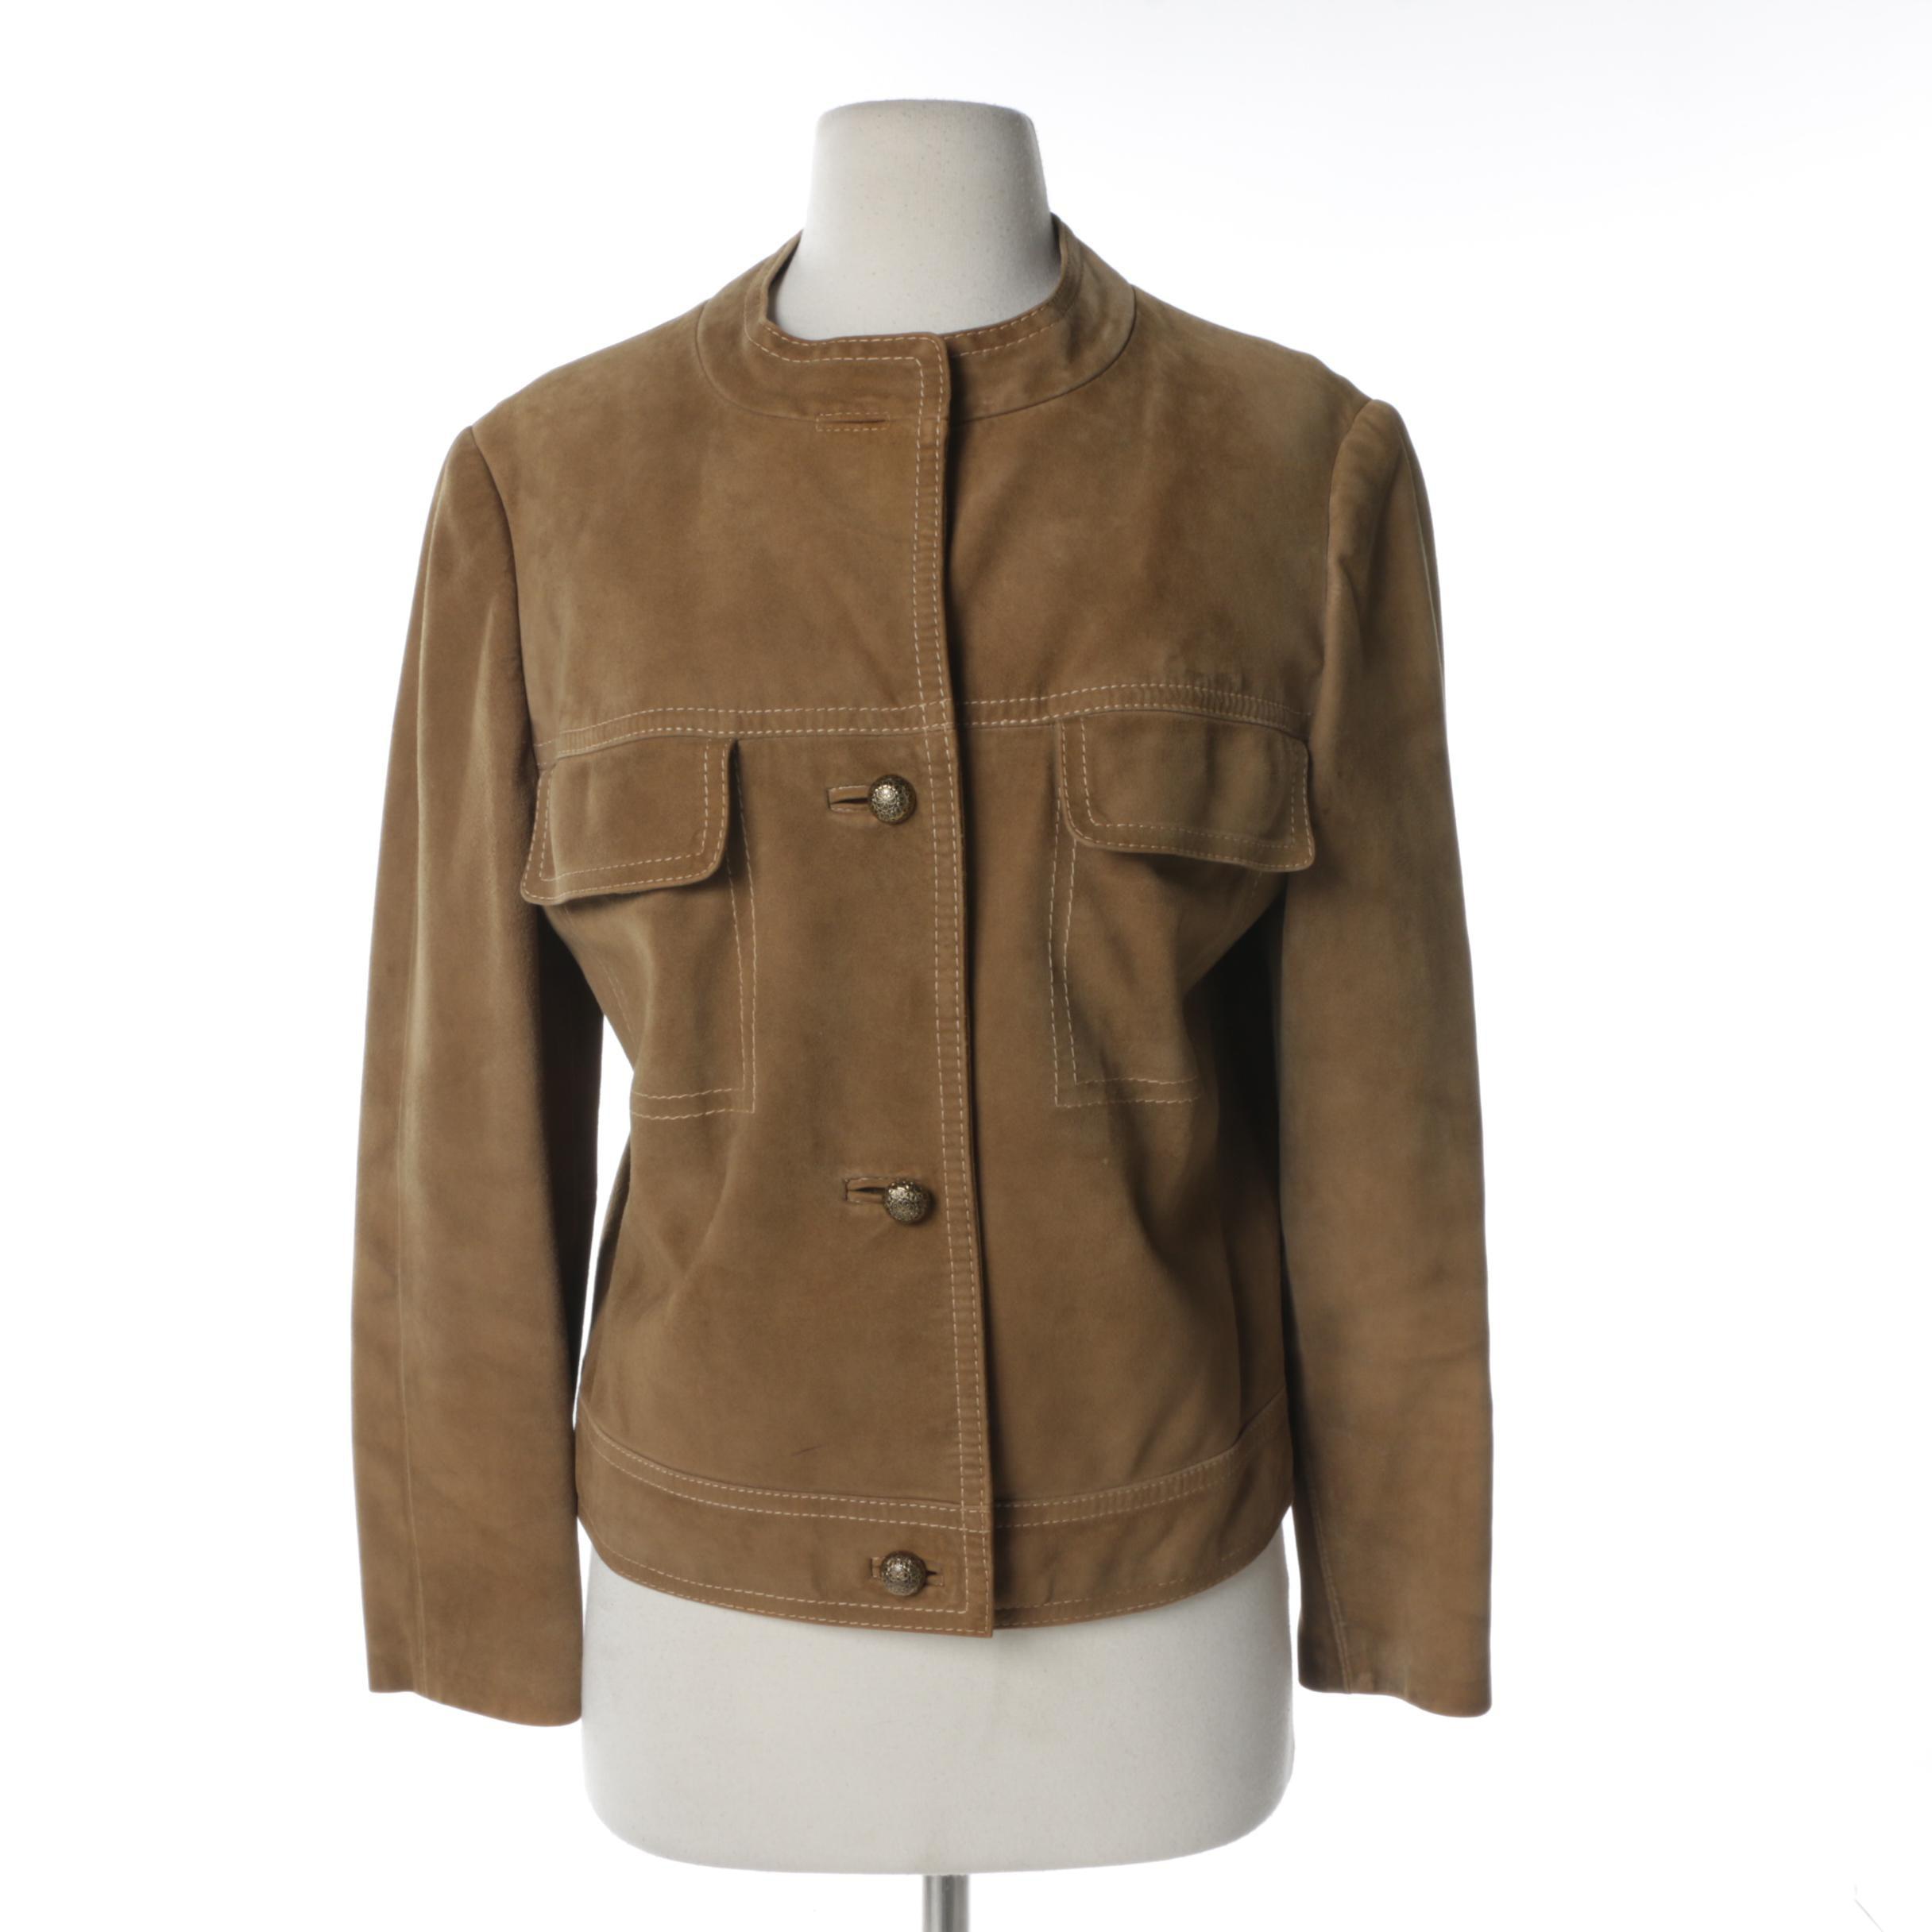 Women's Spieth Style Suede Jacket